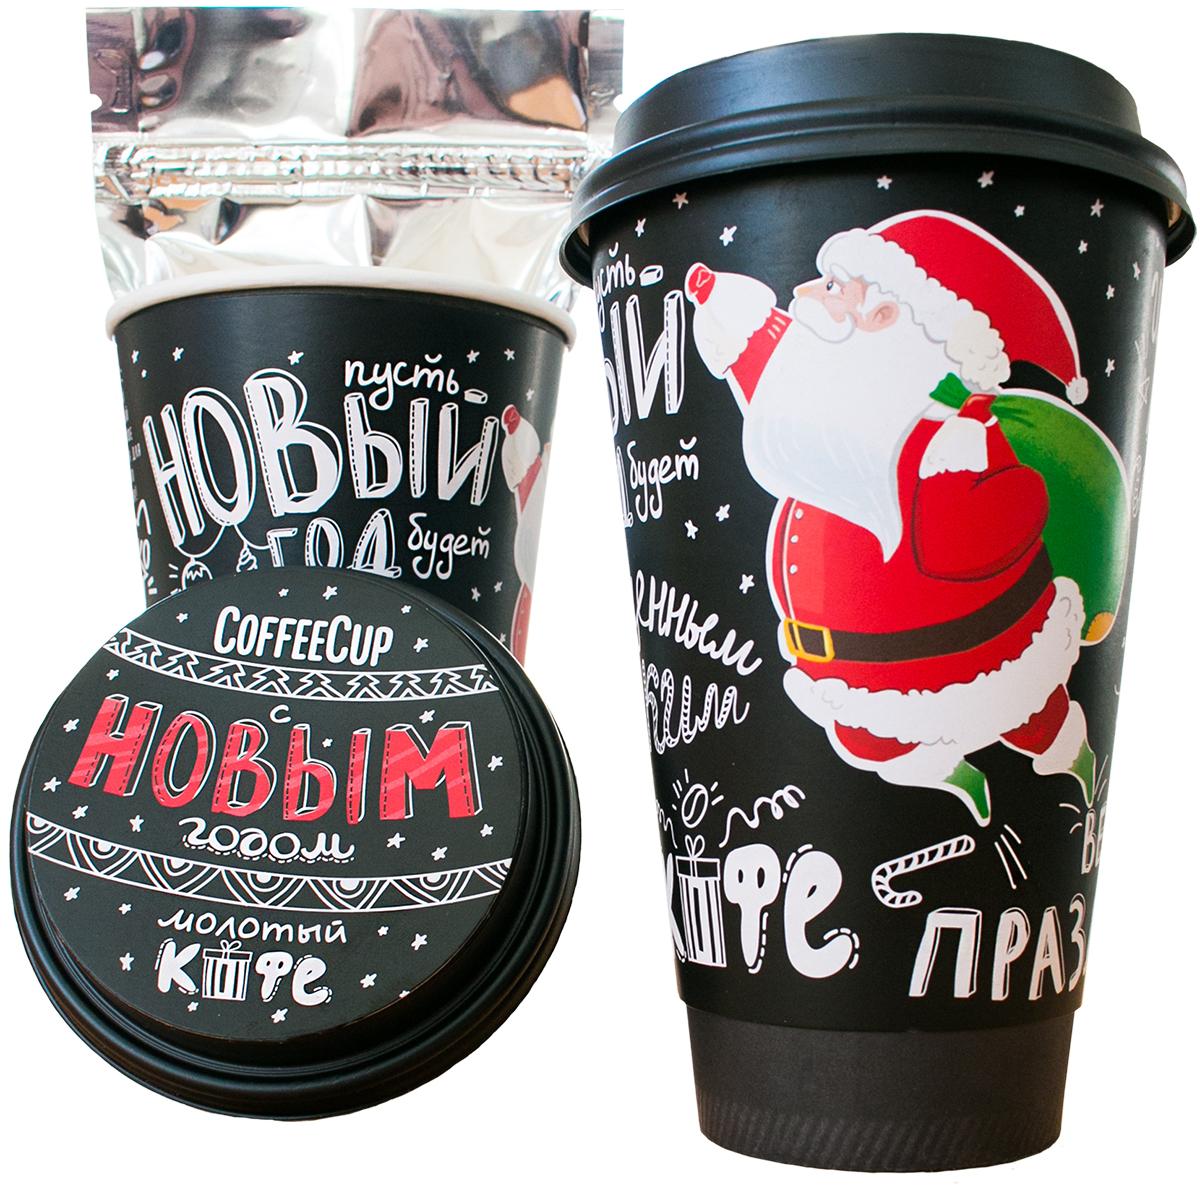 Chokocat С новым годом молотый кофе, 100 г чай шар подарочный с новым годом и рождеством 60гр купаж черн и зел цейло